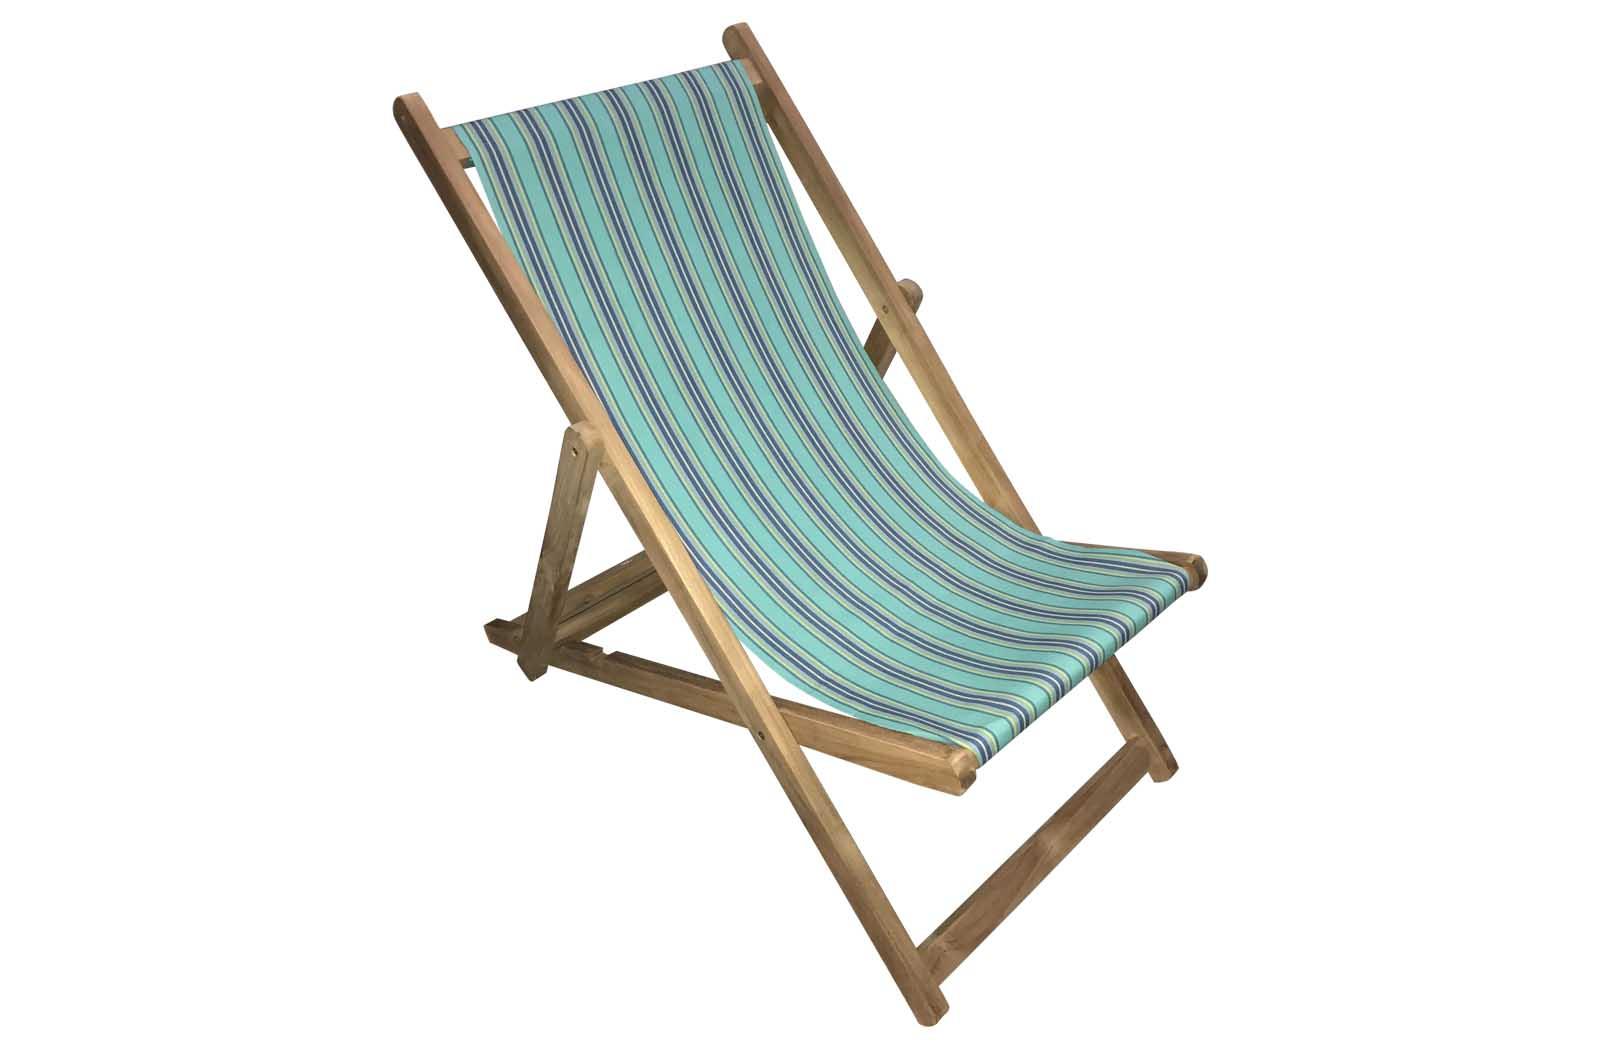 Turquoise Deckchair Canvas Striped Deck Chair Fabrics